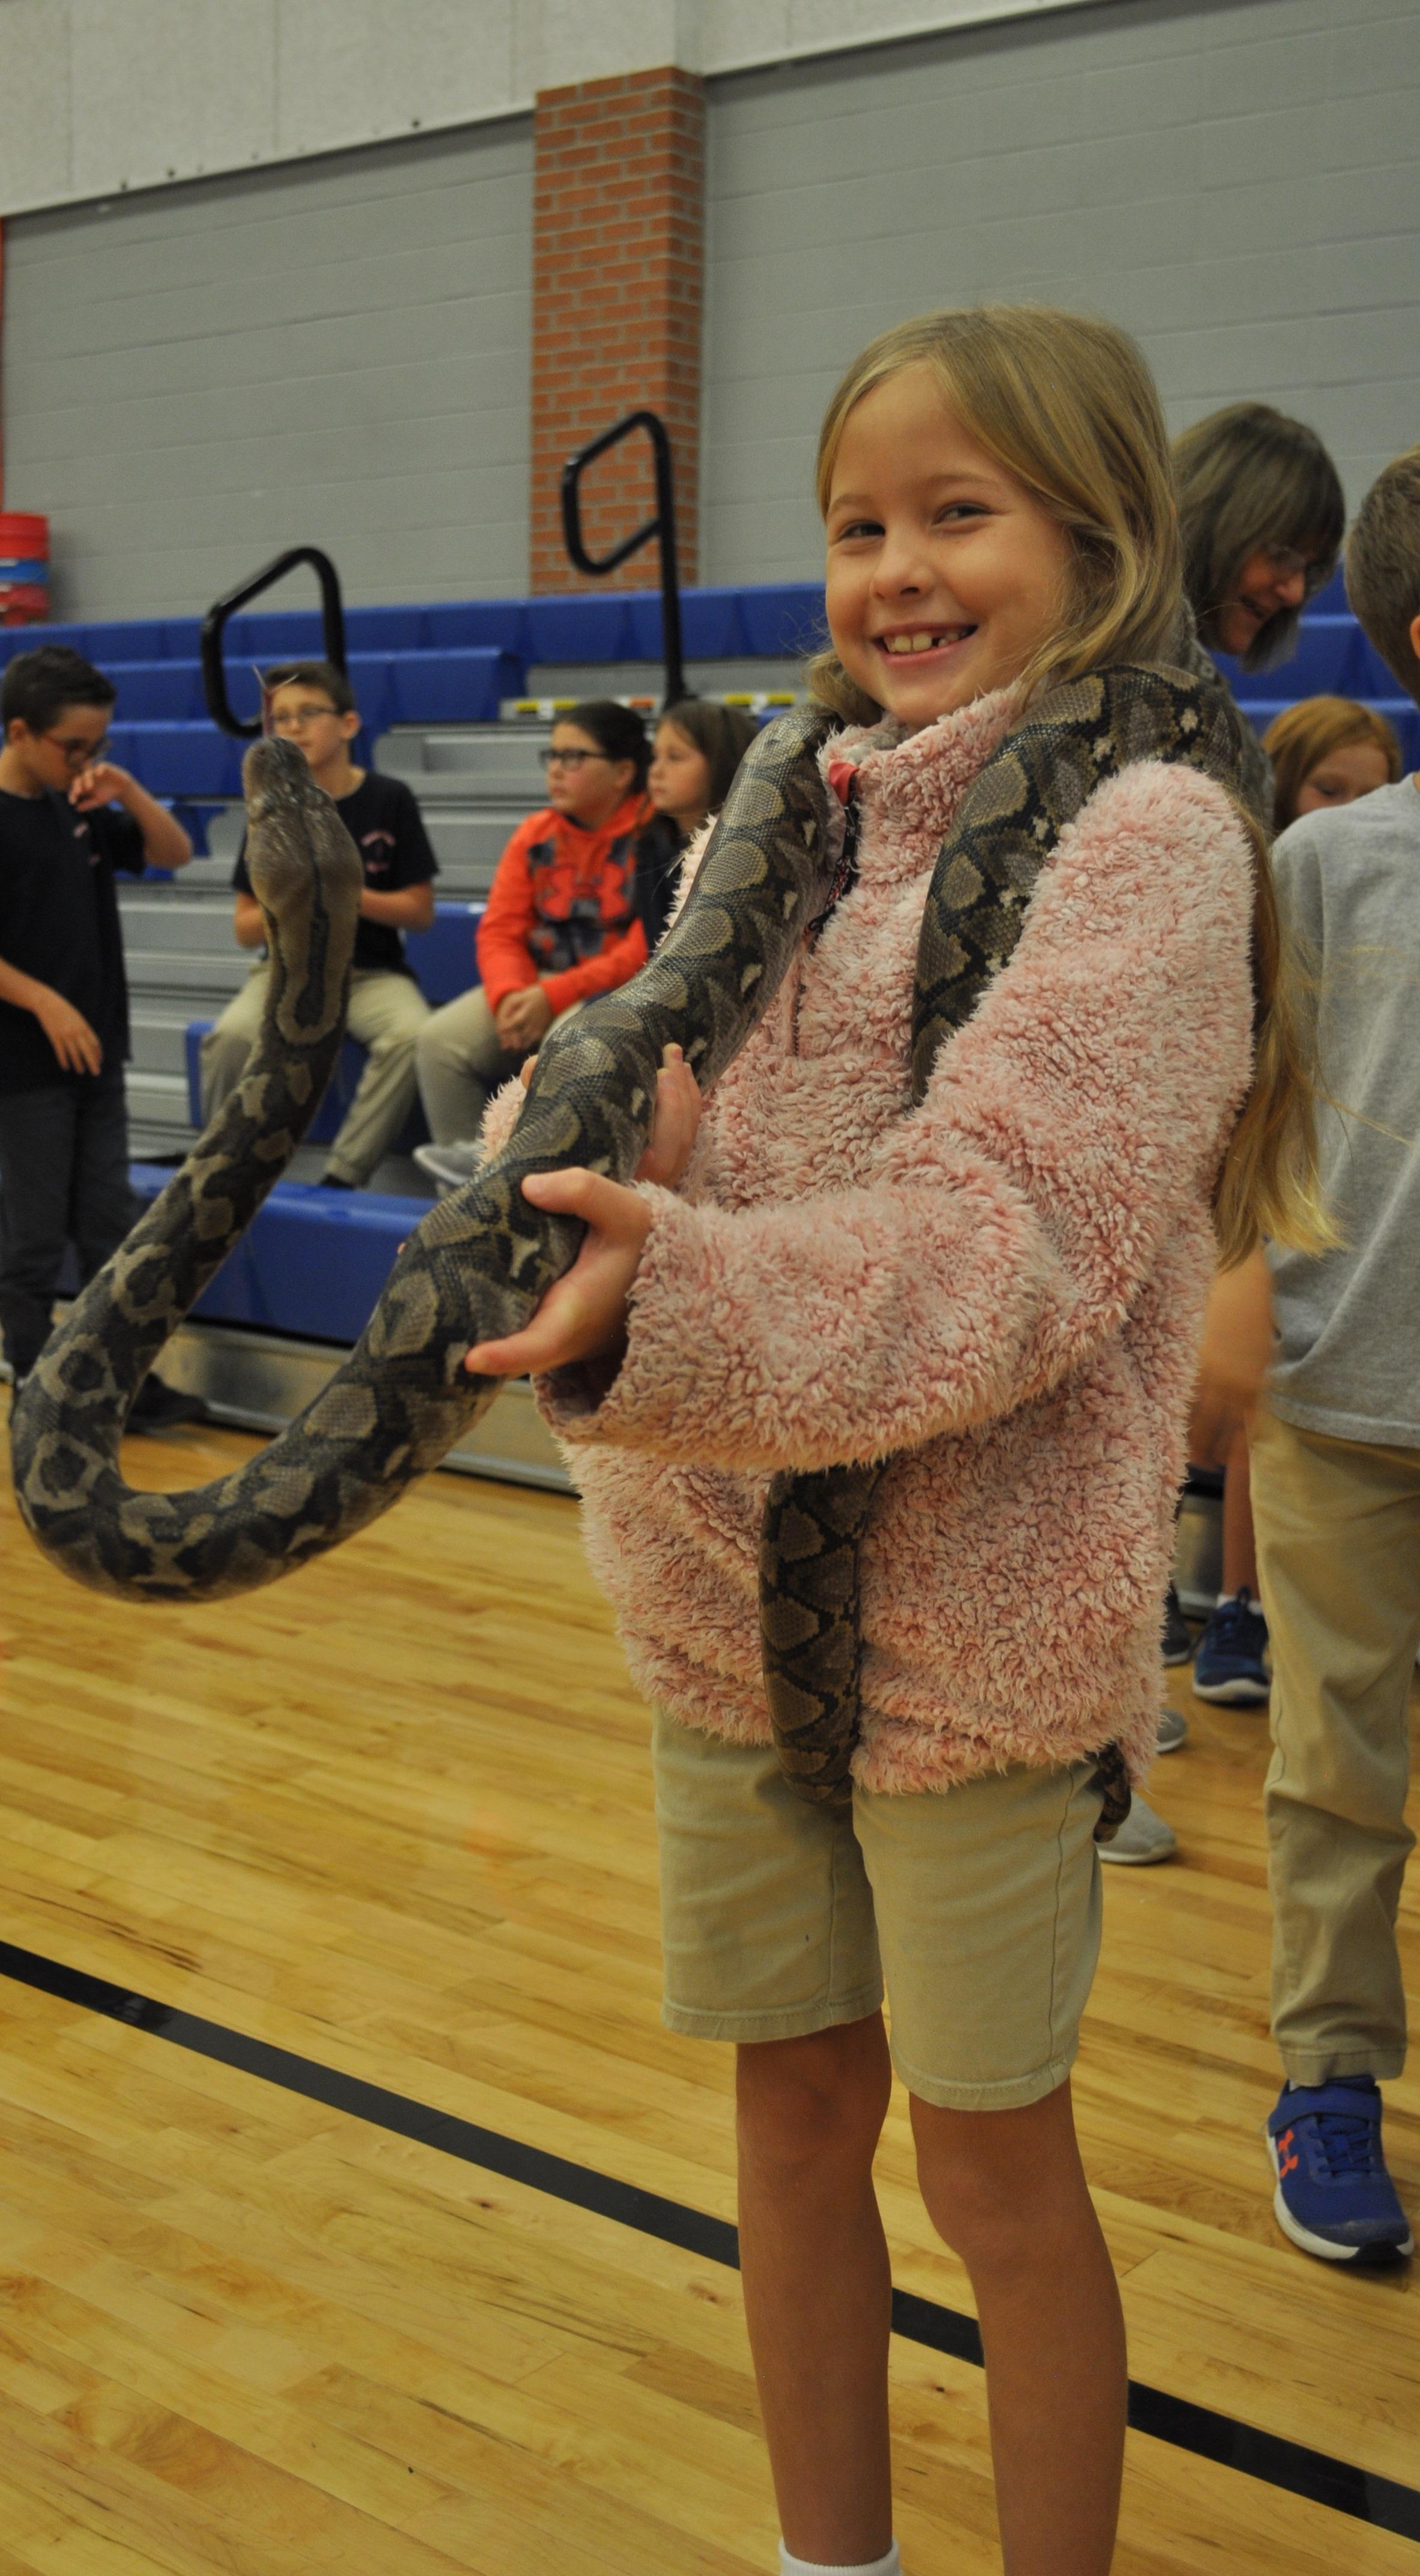 JB_Romero girl_with snake